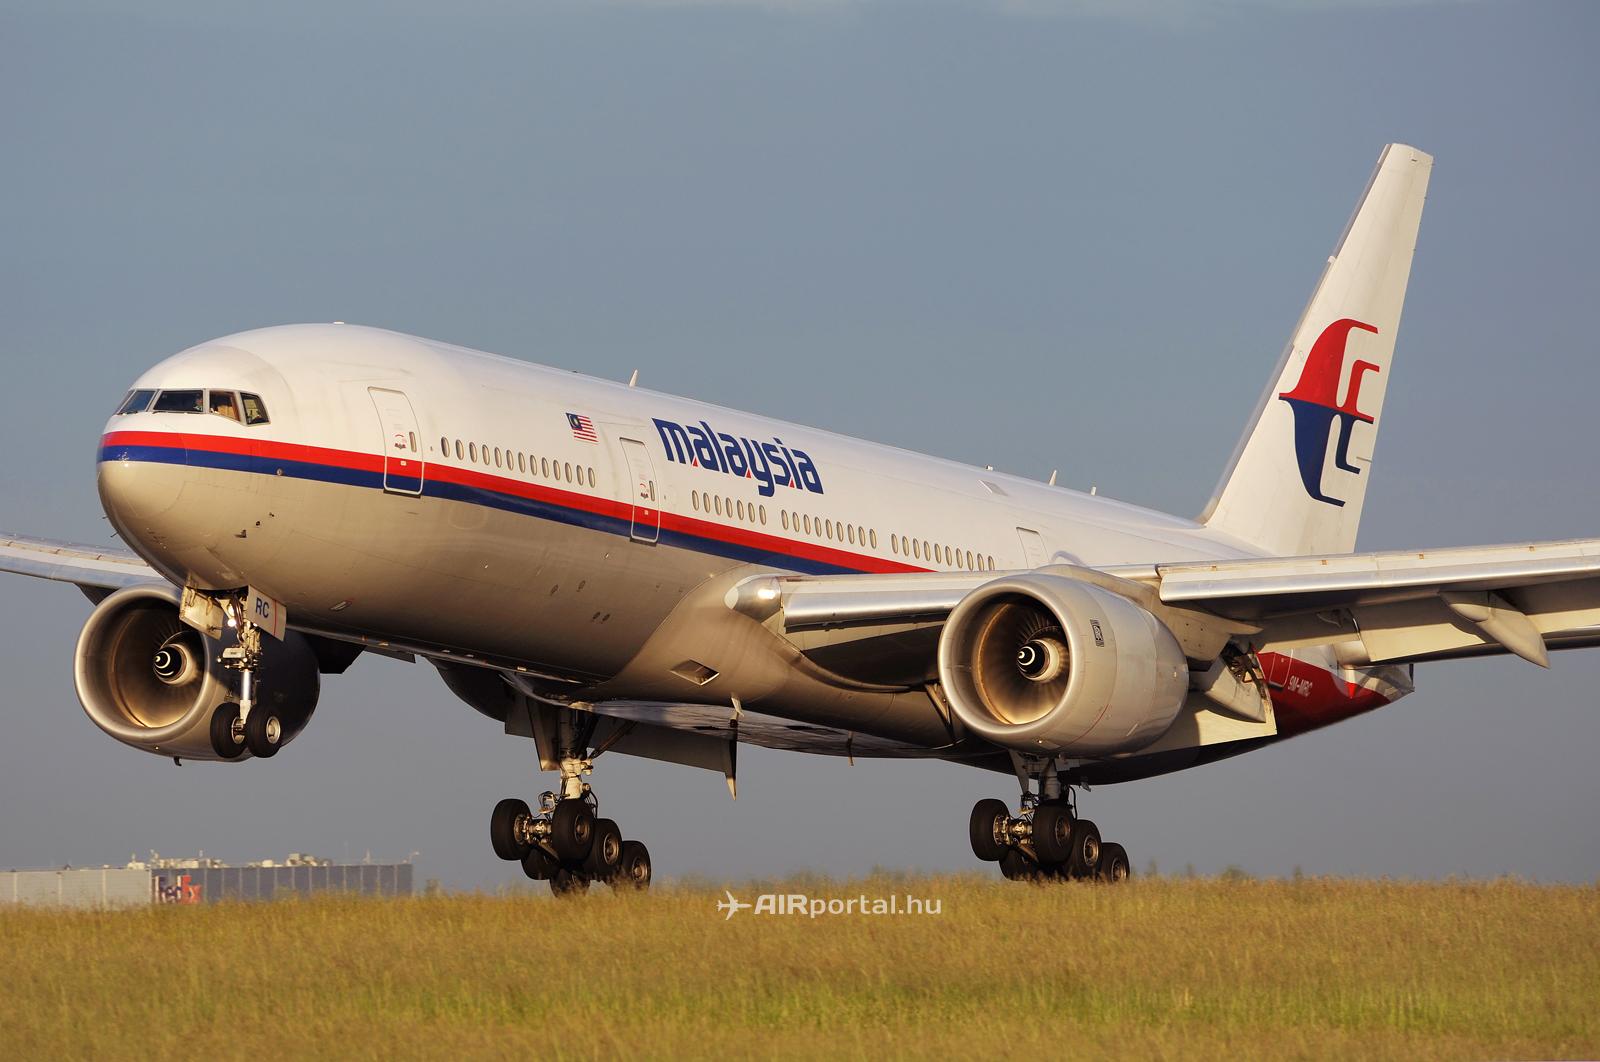 A Malaysian Airlines Boeing 777-200ER típusú repülőgépe a párizsi Charles de Gaulle repülőterén.(Fotó: Kovács Gábor - AIRportal.hu) | © AIRportal.hu